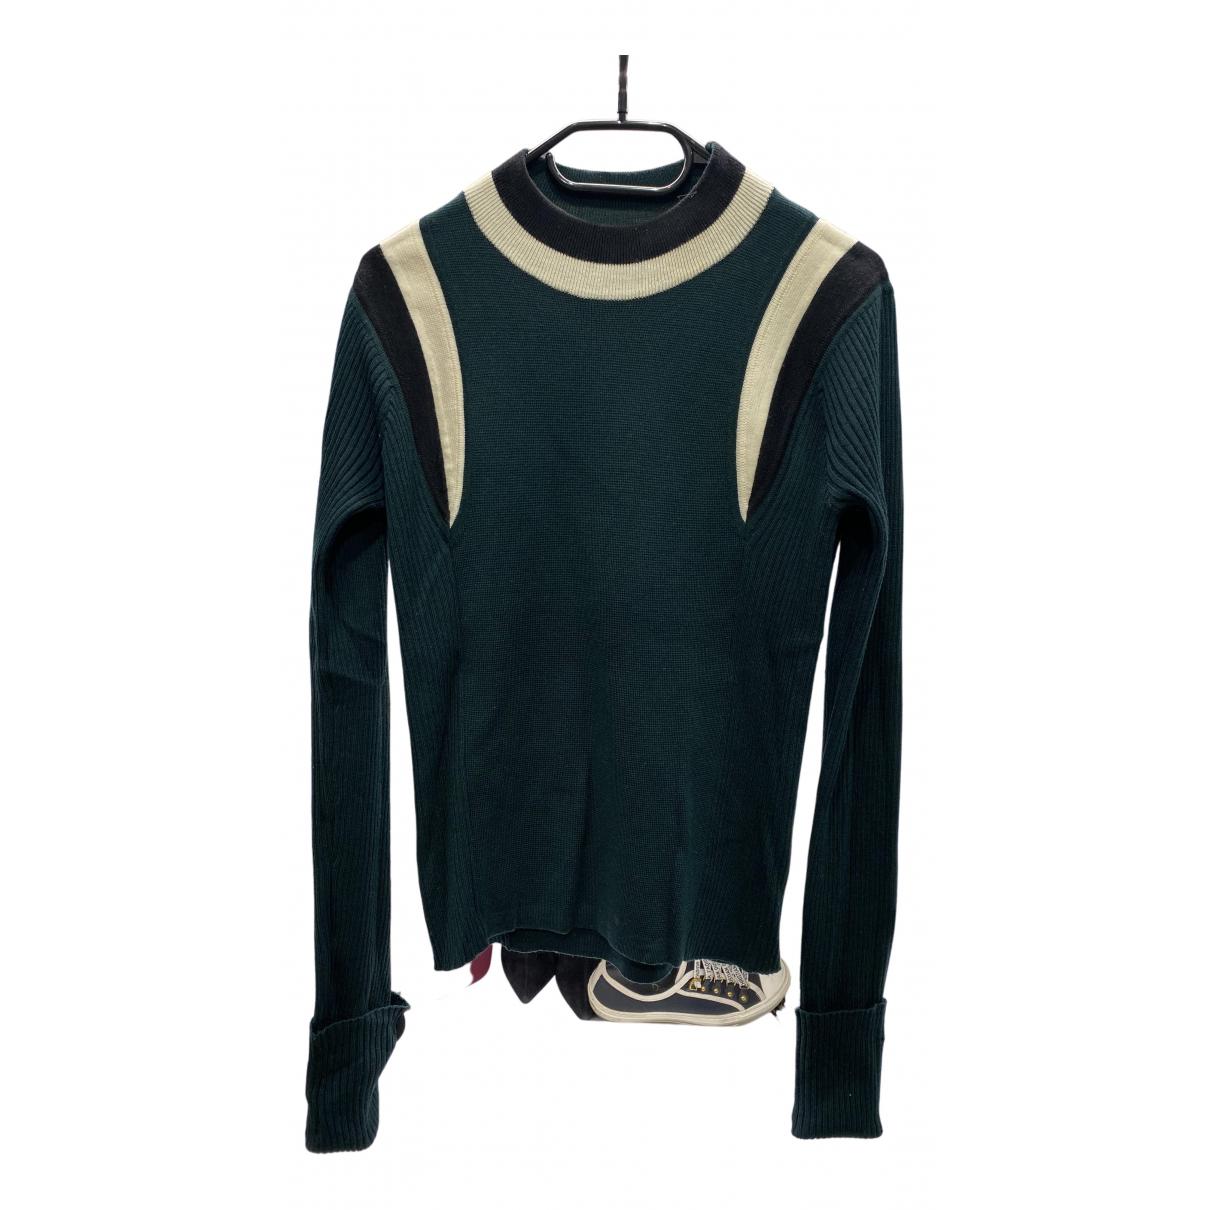 Marni \N Pullover in  Gruen Wolle